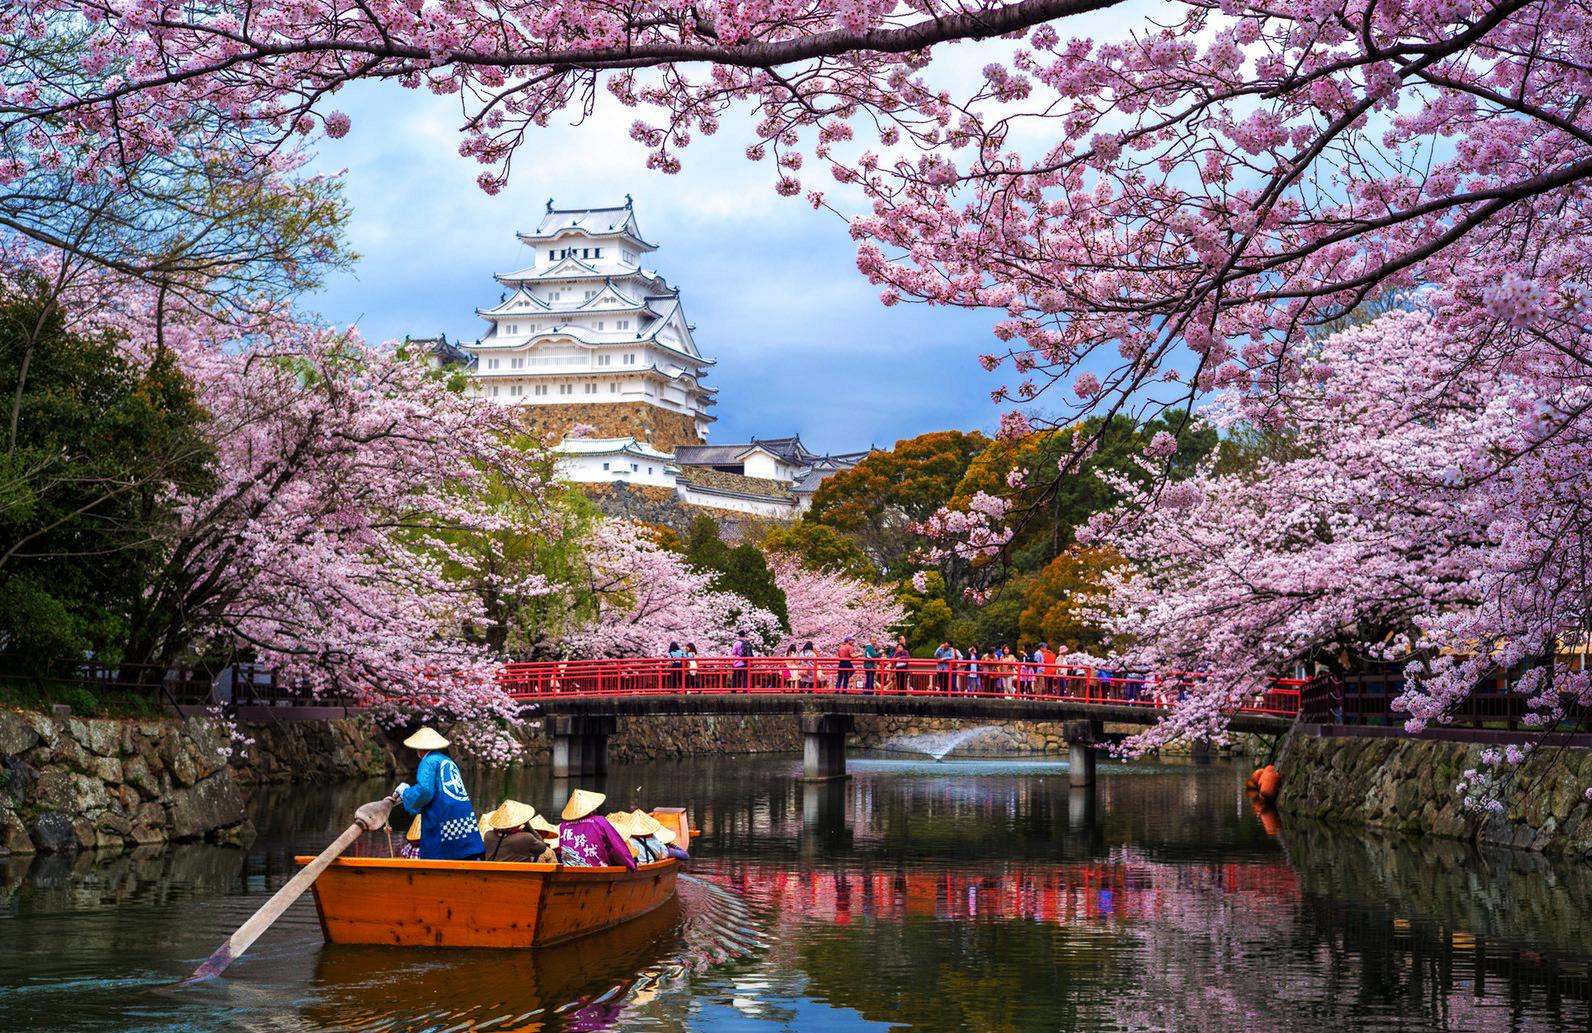 Hijime castle